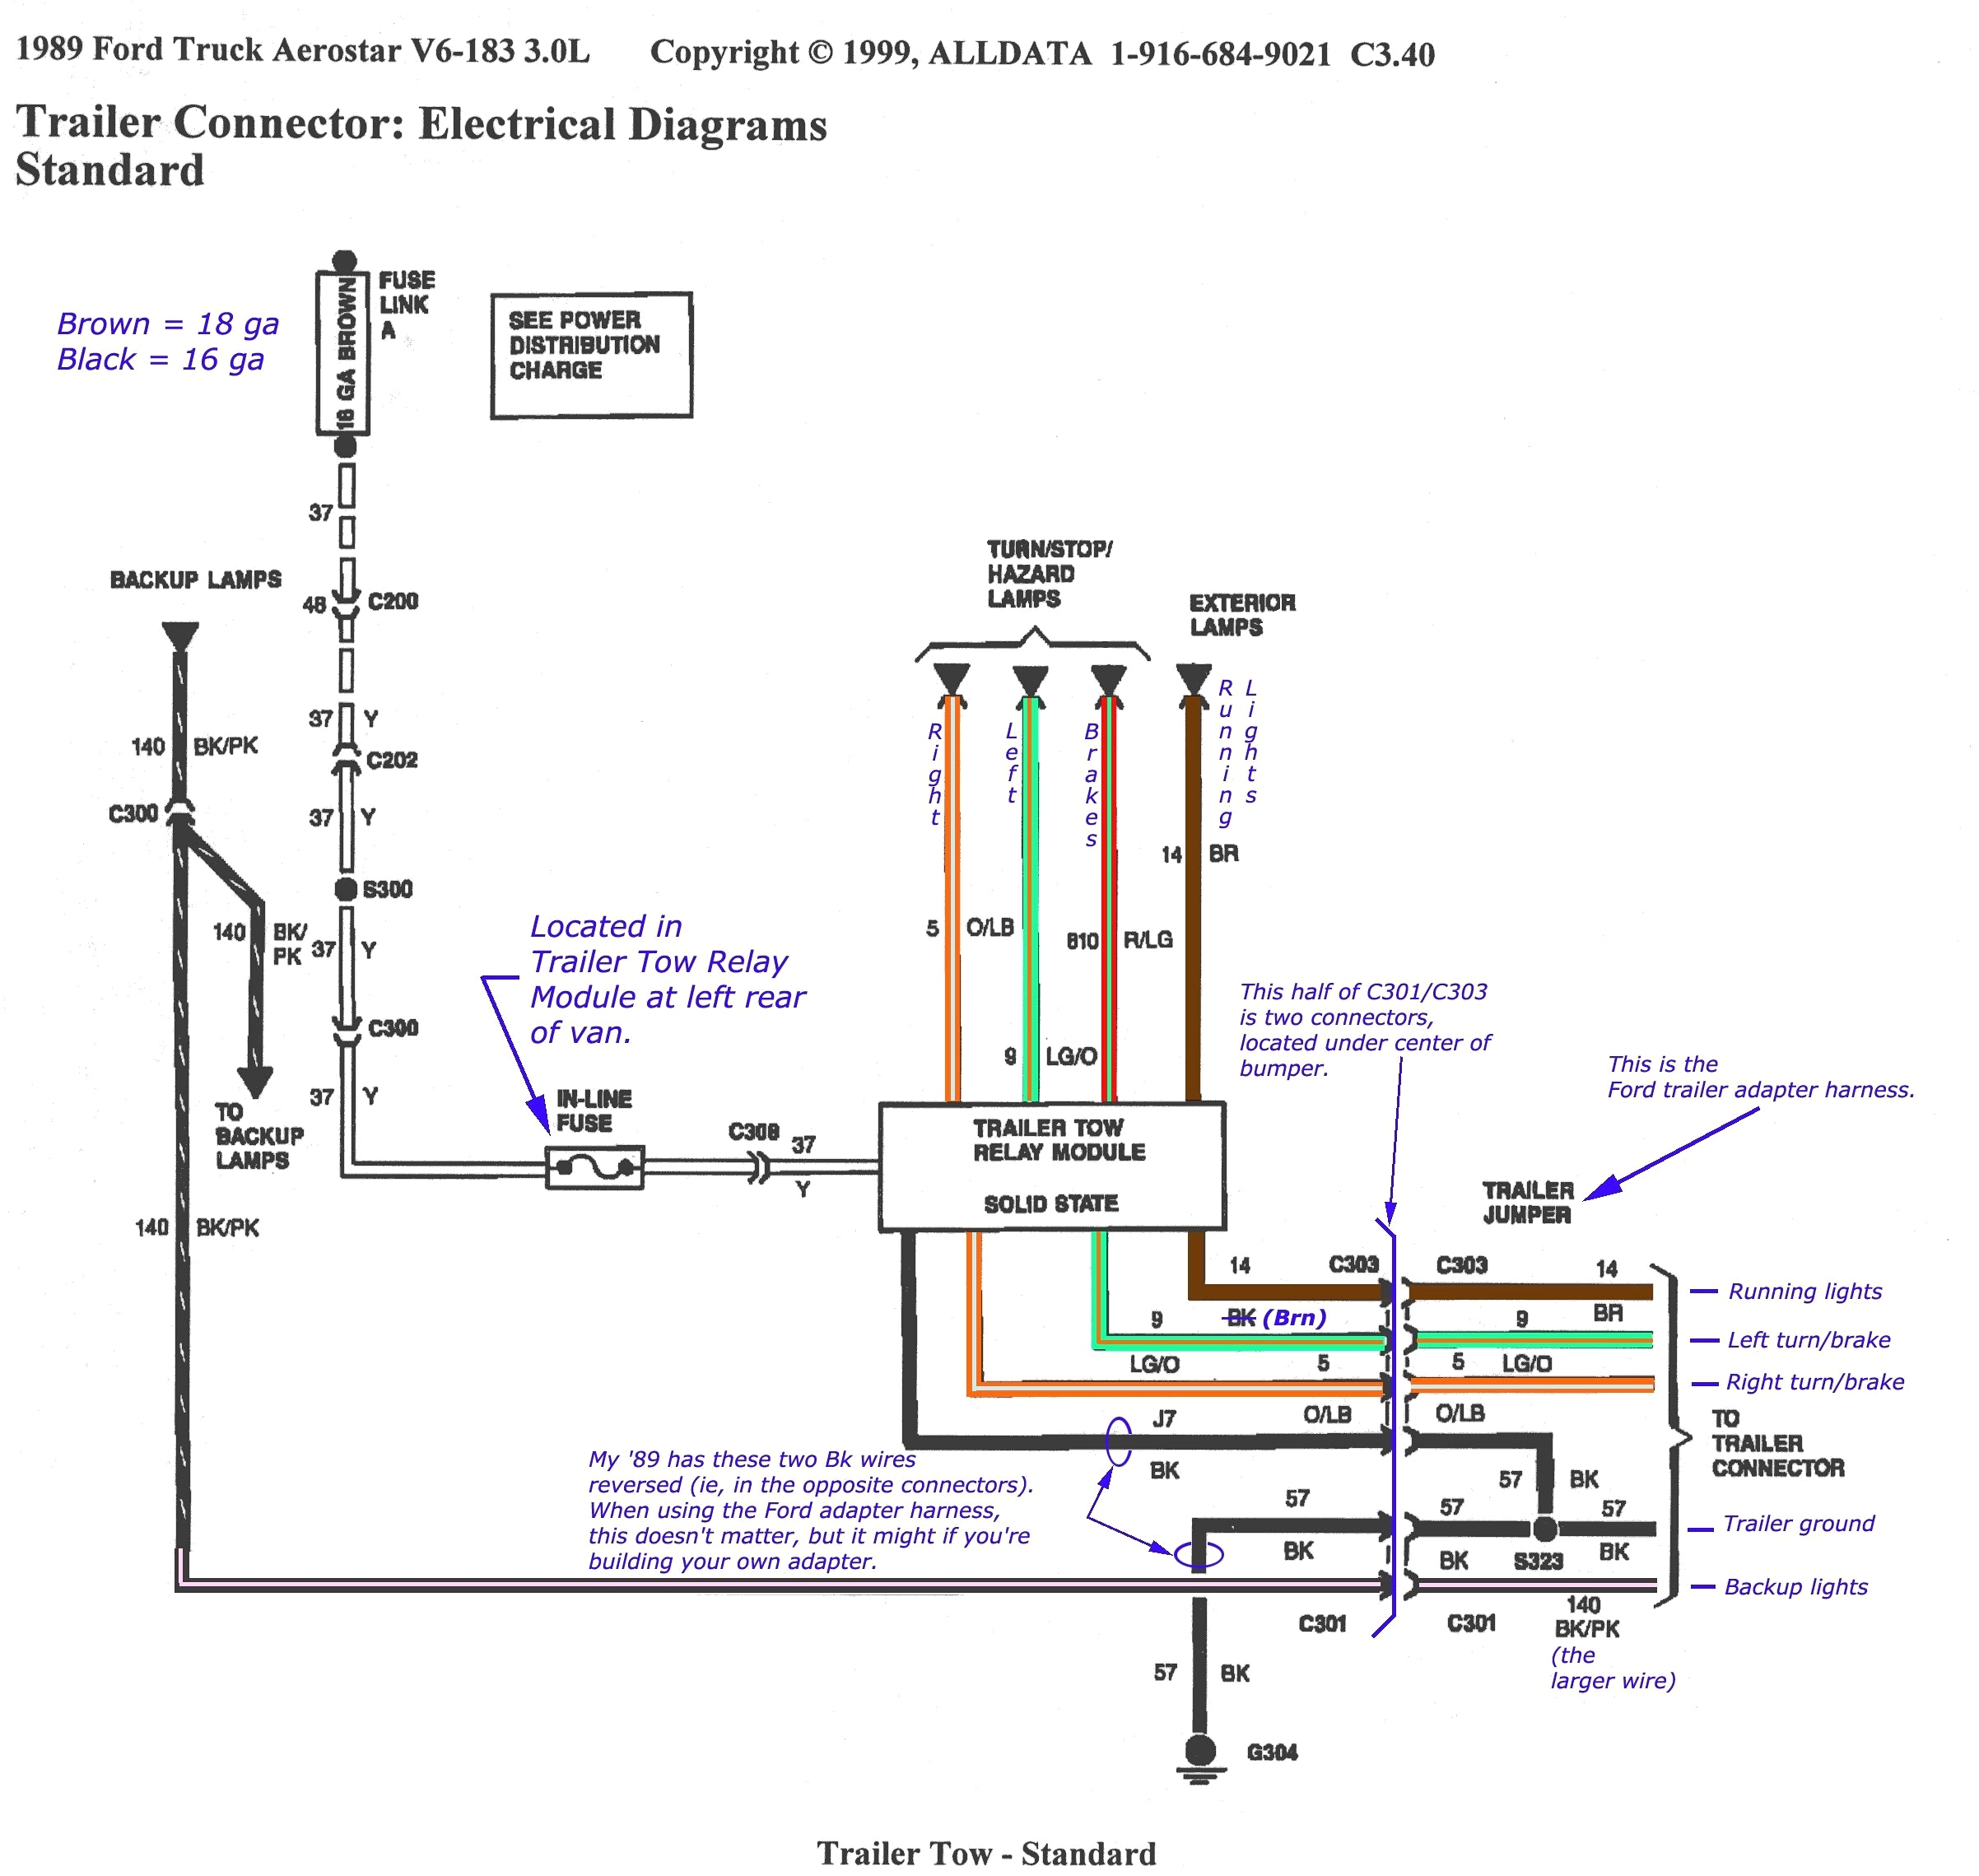 06 f350 trailer wiring diagram wiring diagram img 2006 ford explorer trailer wiring diagram 06 f250 trailer wire diagram